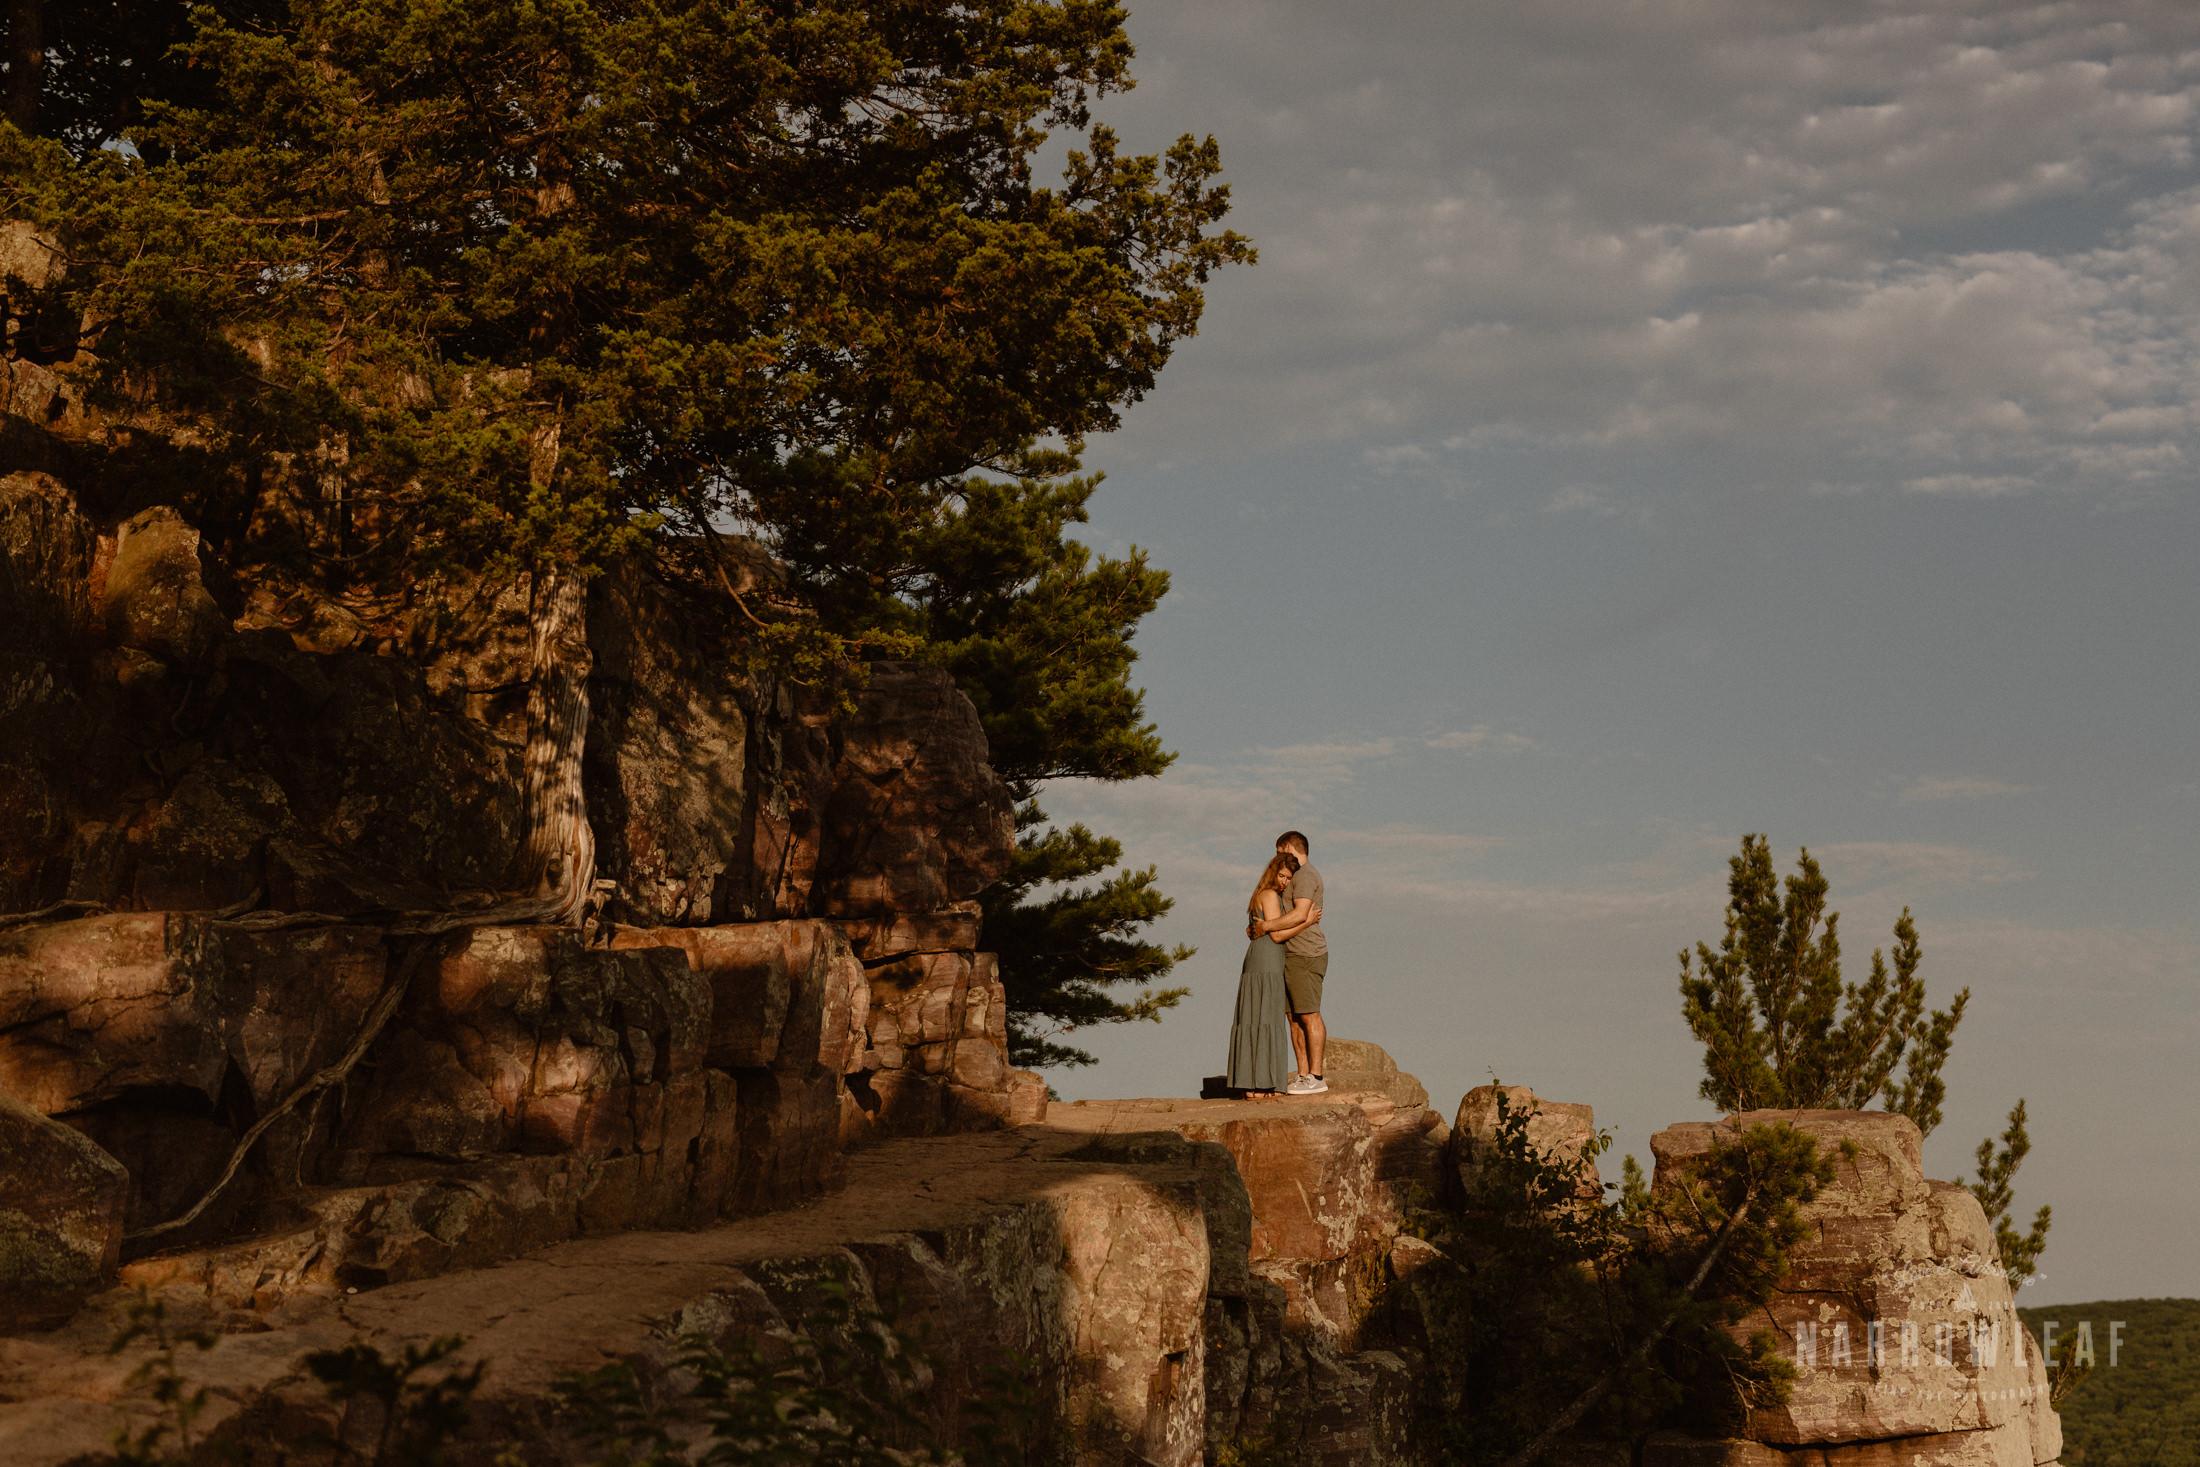 wedding-adventure-photographer-Narrowleaf_Love_and_Adventure_Photography-8367.jpg